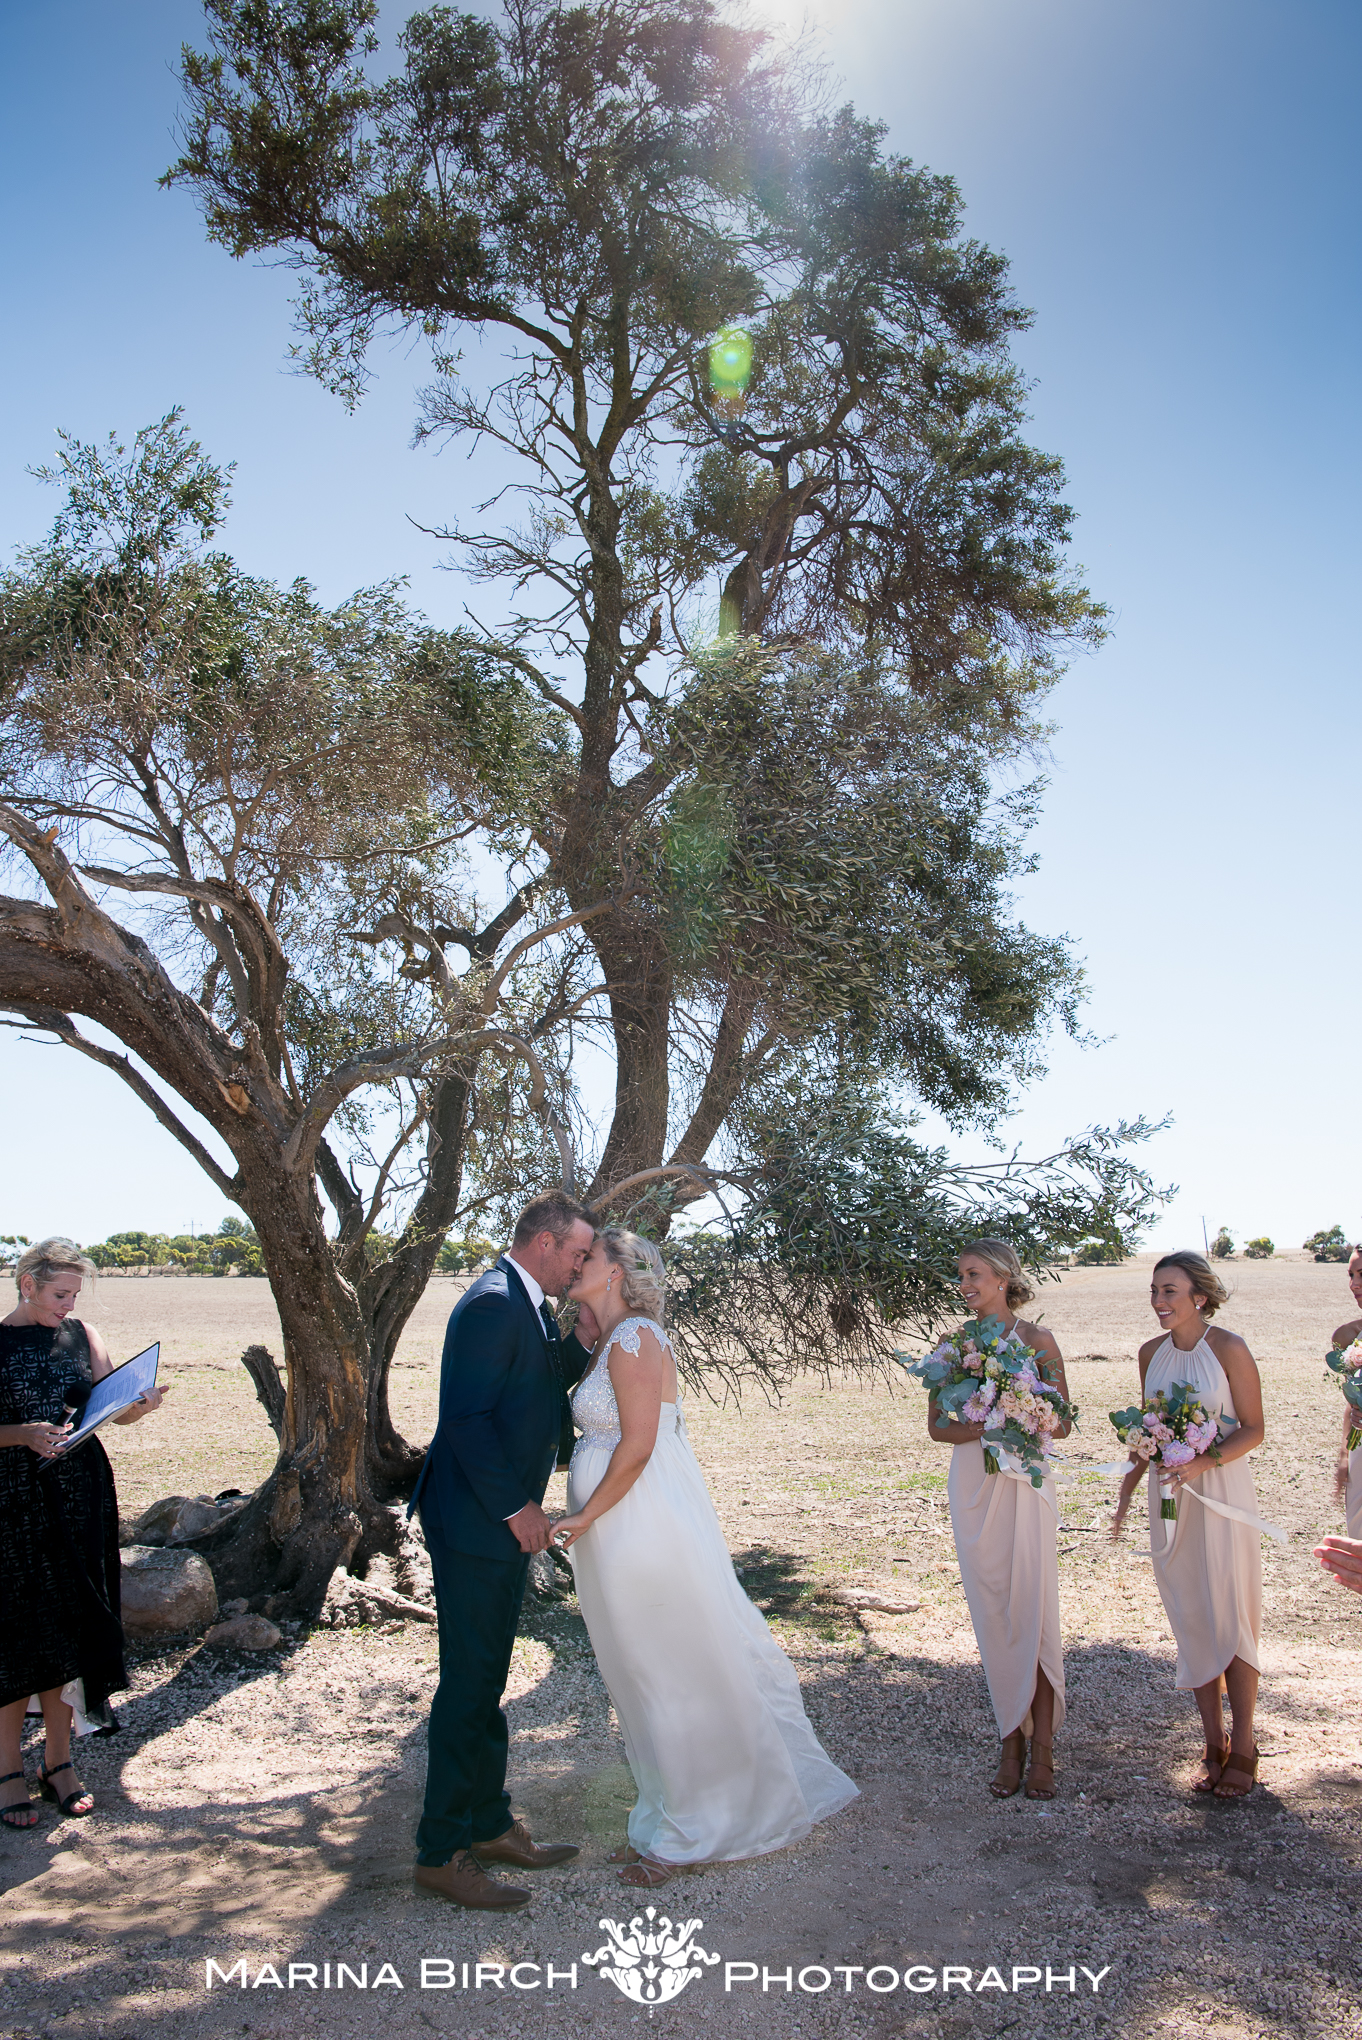 MBP.Parson's wedding-16.jpg